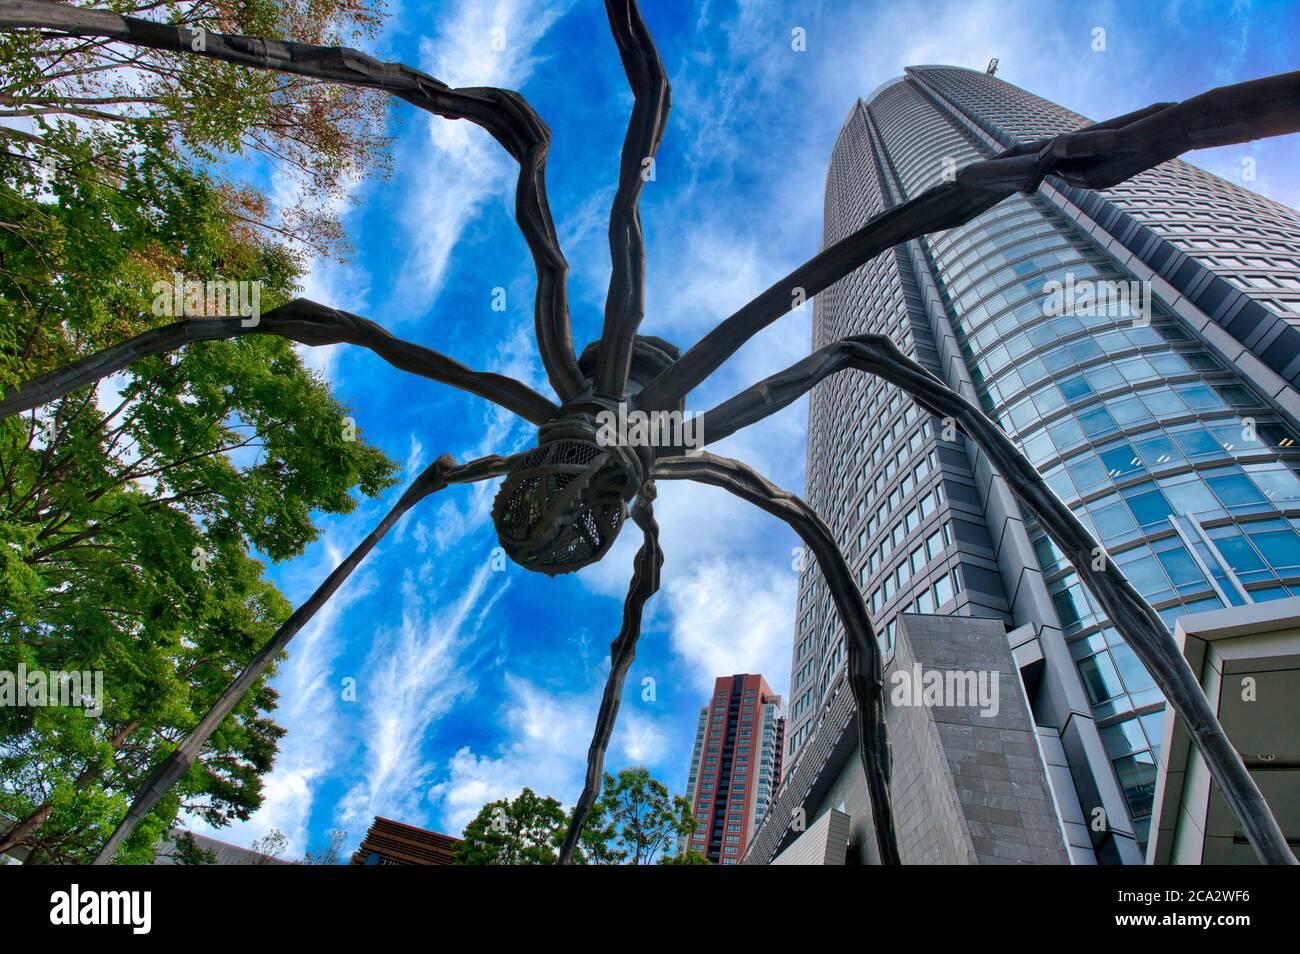 Roppongi Hills Mori Tower, Spider of Louise Bourgeois, Tokyo, Japan Stock Photo